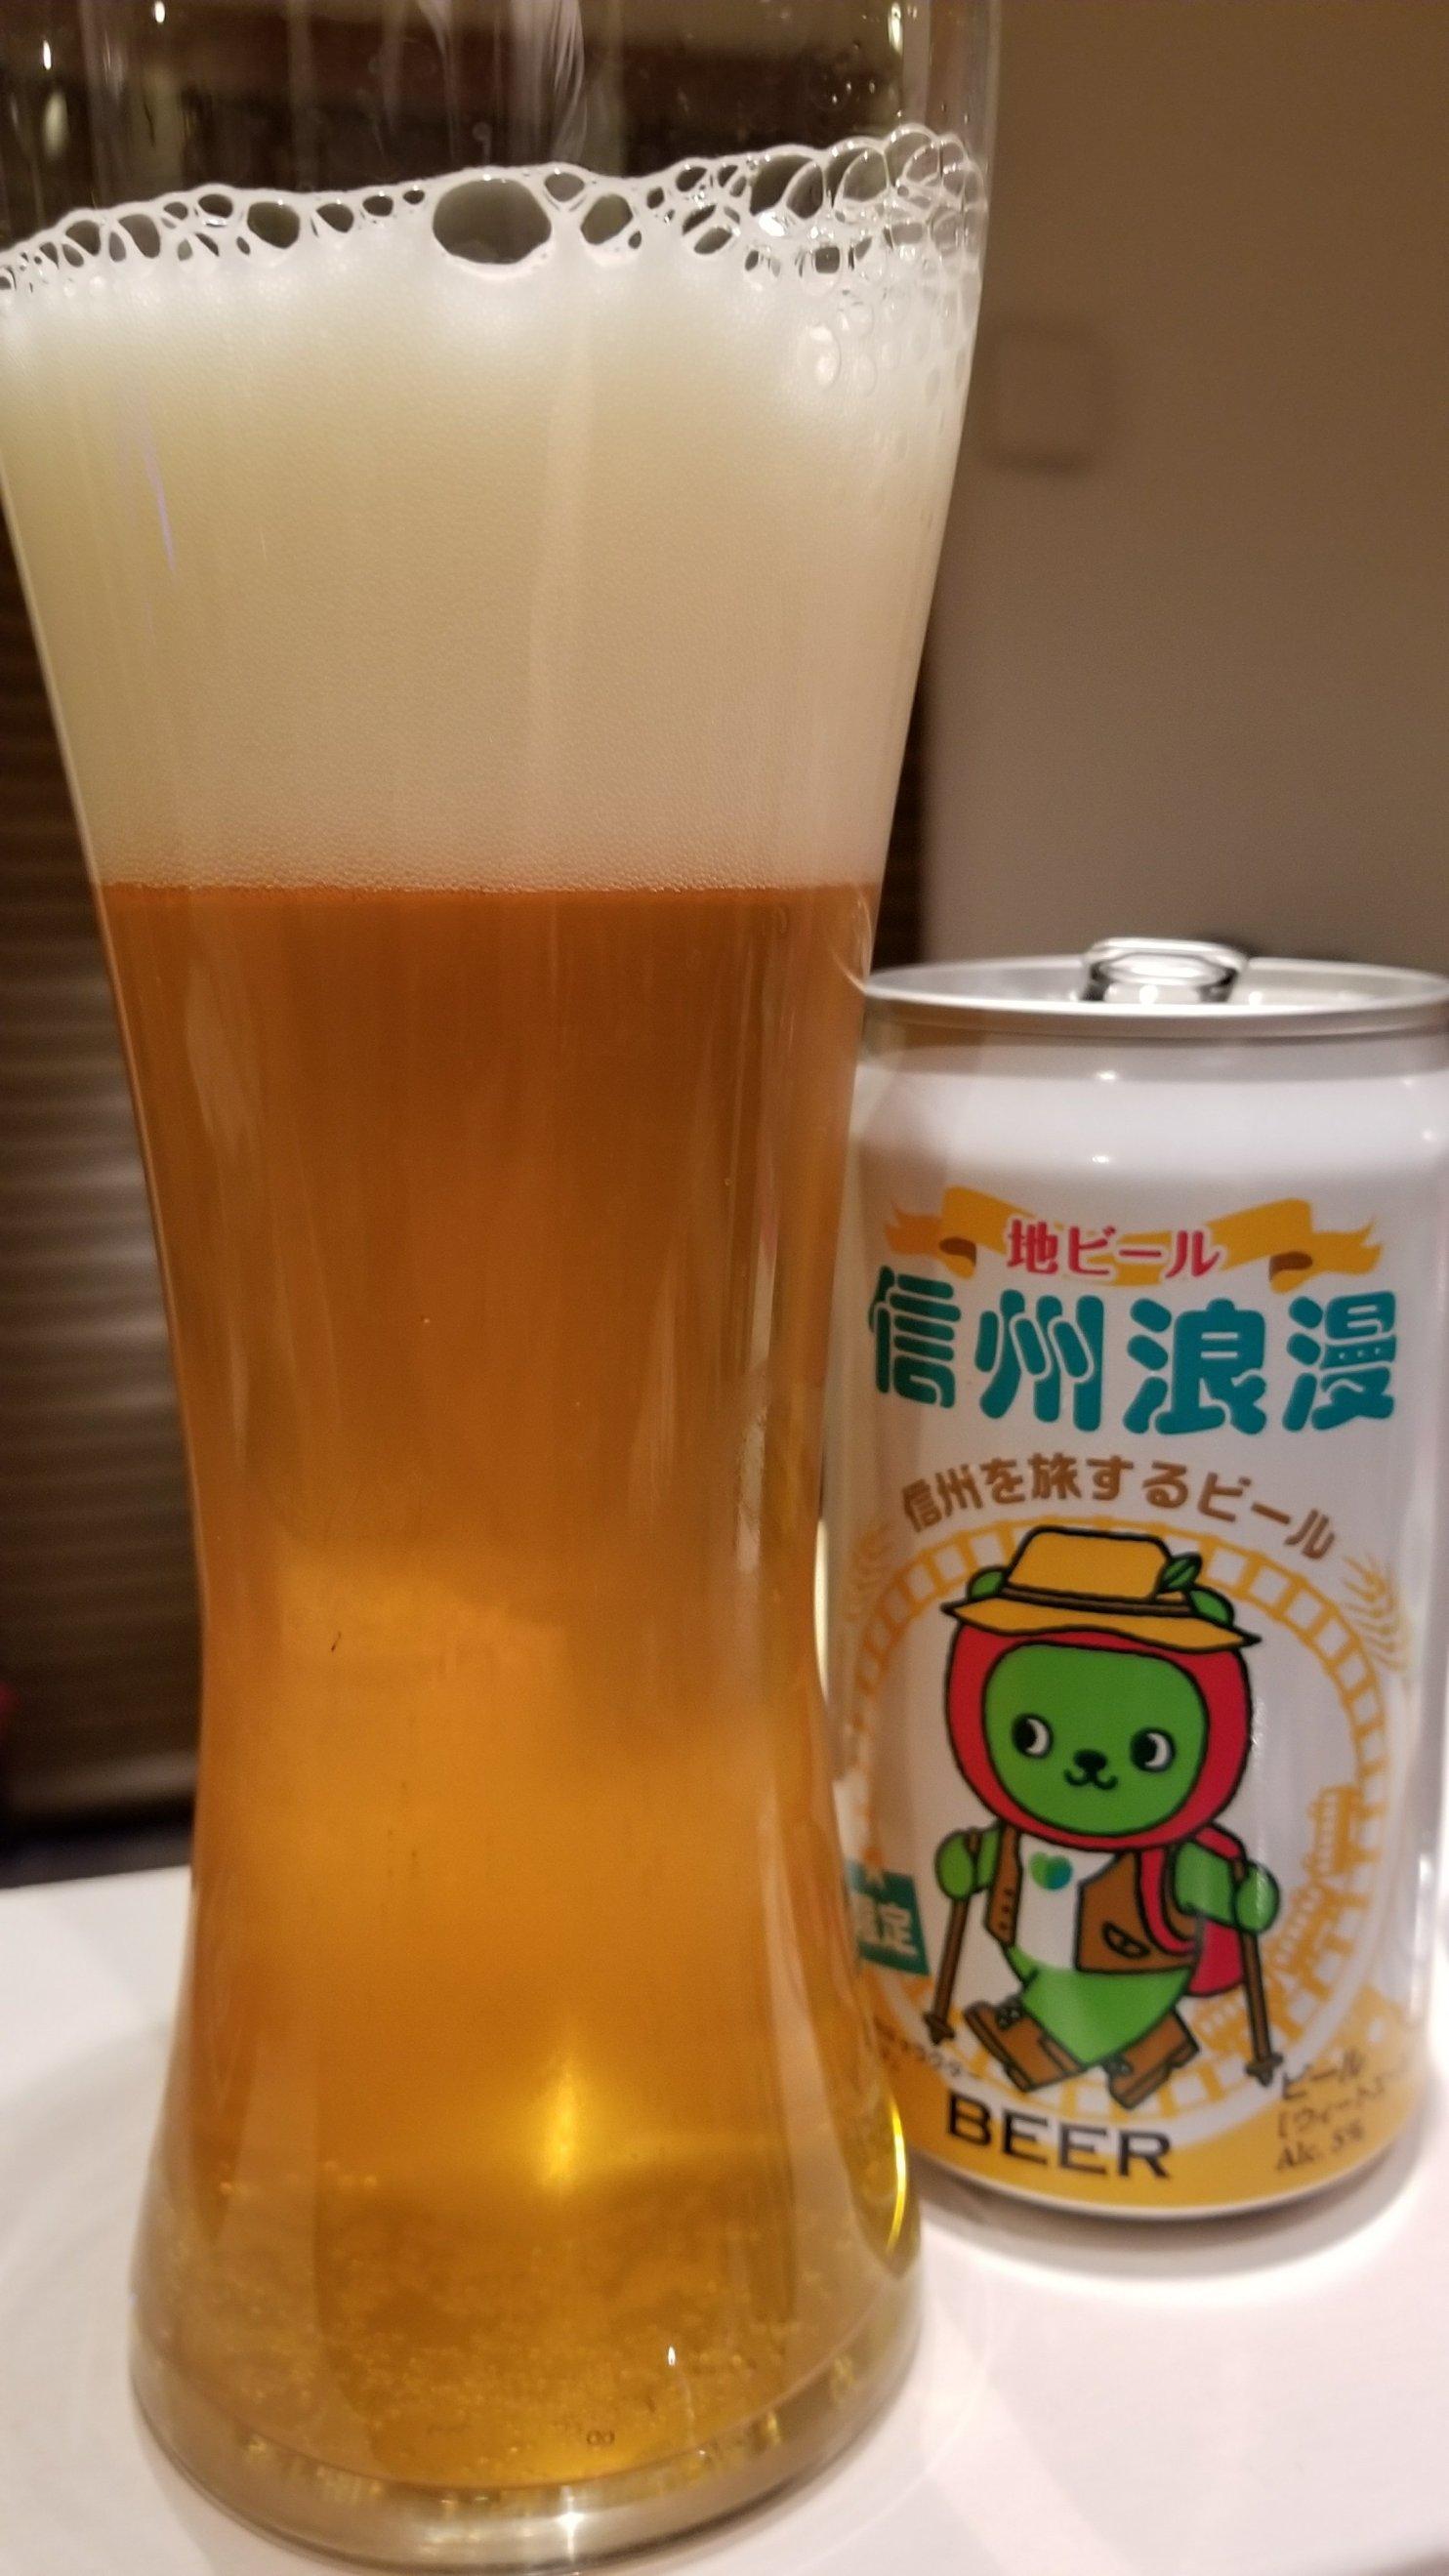 Shinshu Roman Wheat Ale 信州浪漫ビール ウィートエール